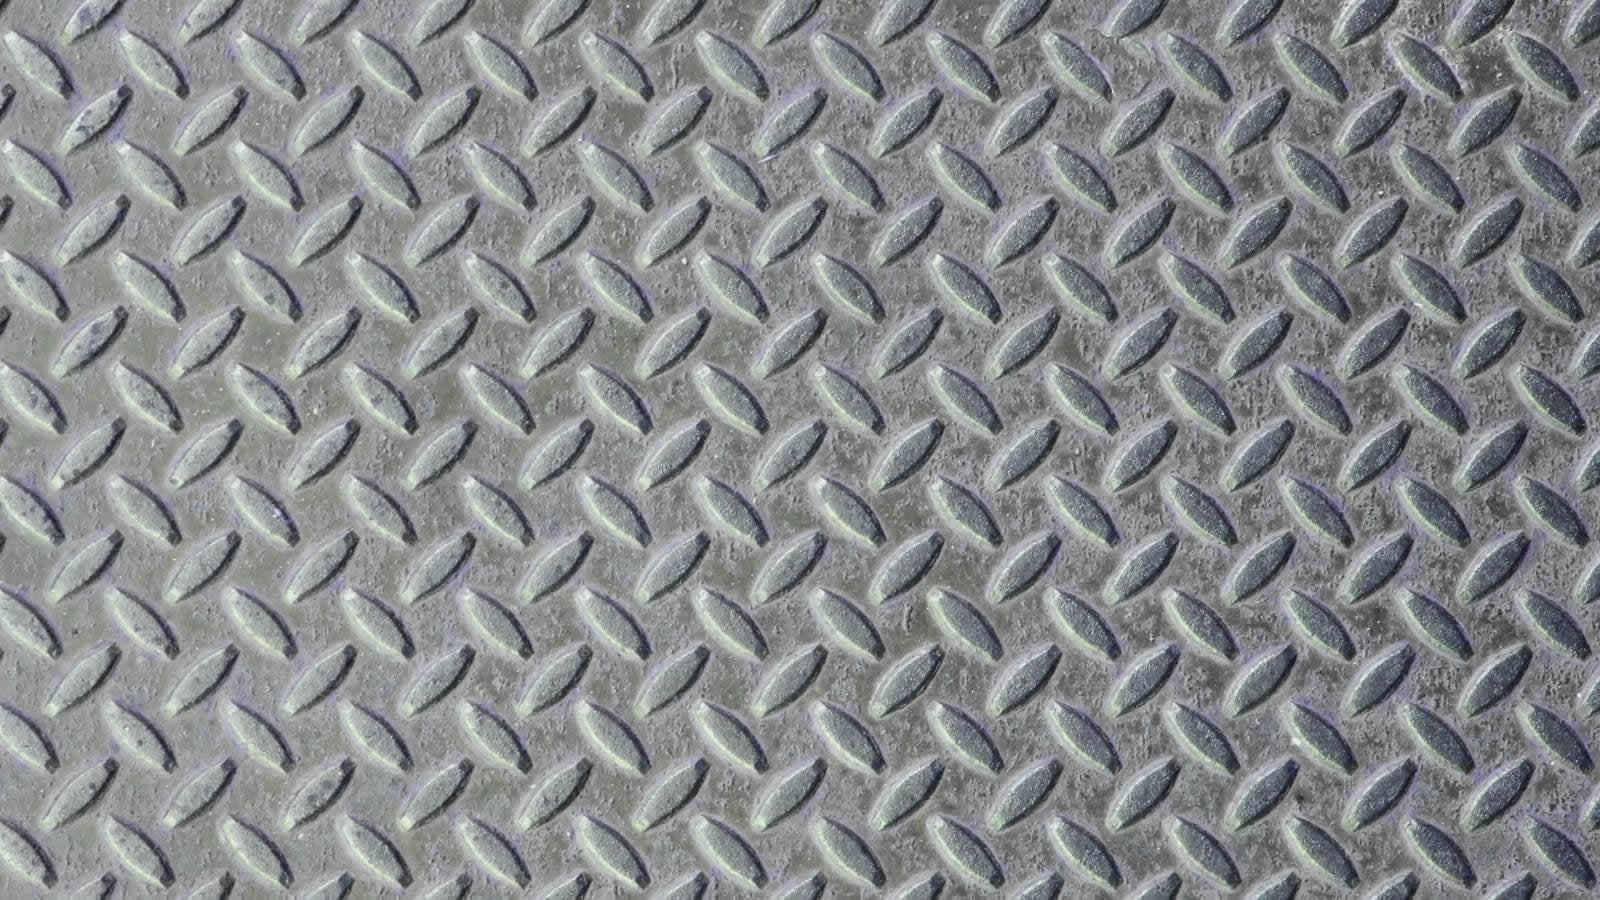 Diamond plate 1600x900